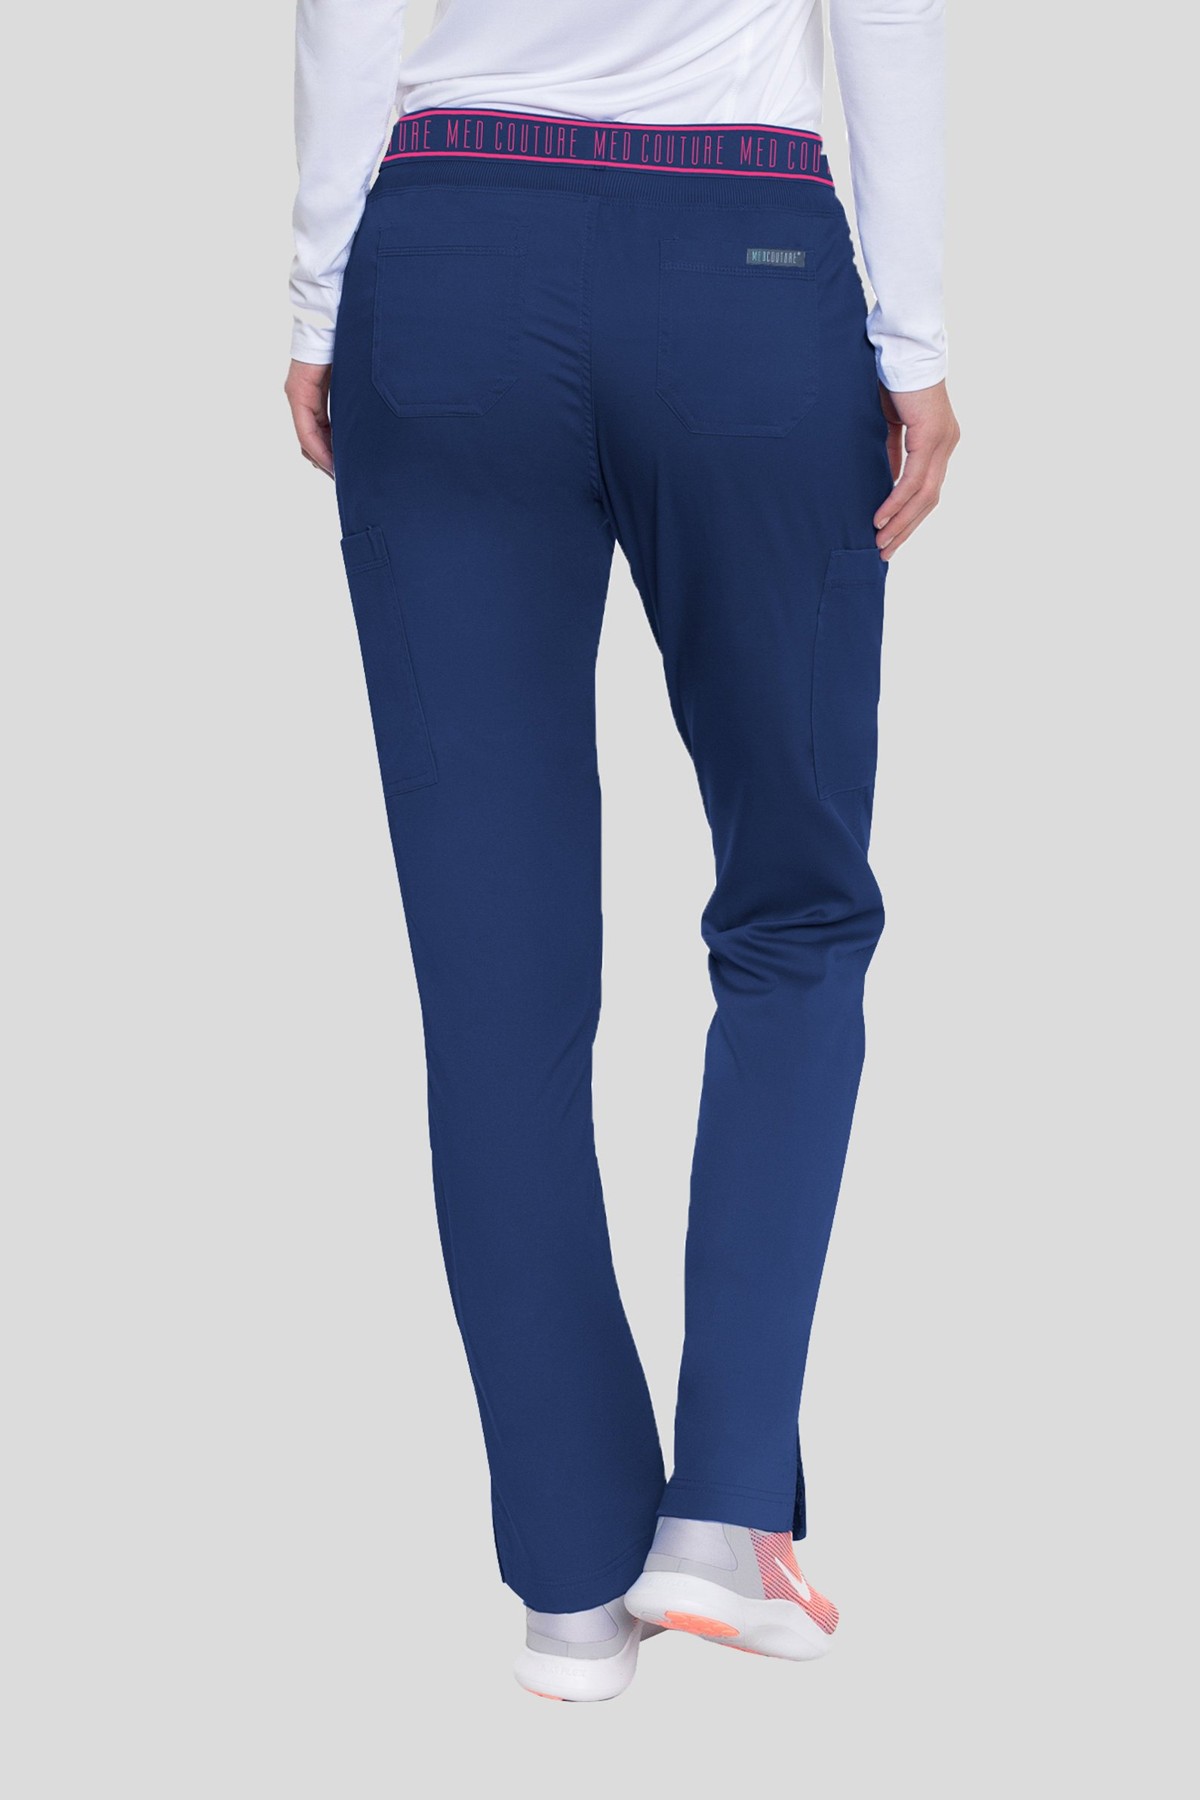 127c6aa4 Spodnie medyczne damskie Med Couture Performance Touch, 7739-NAVY